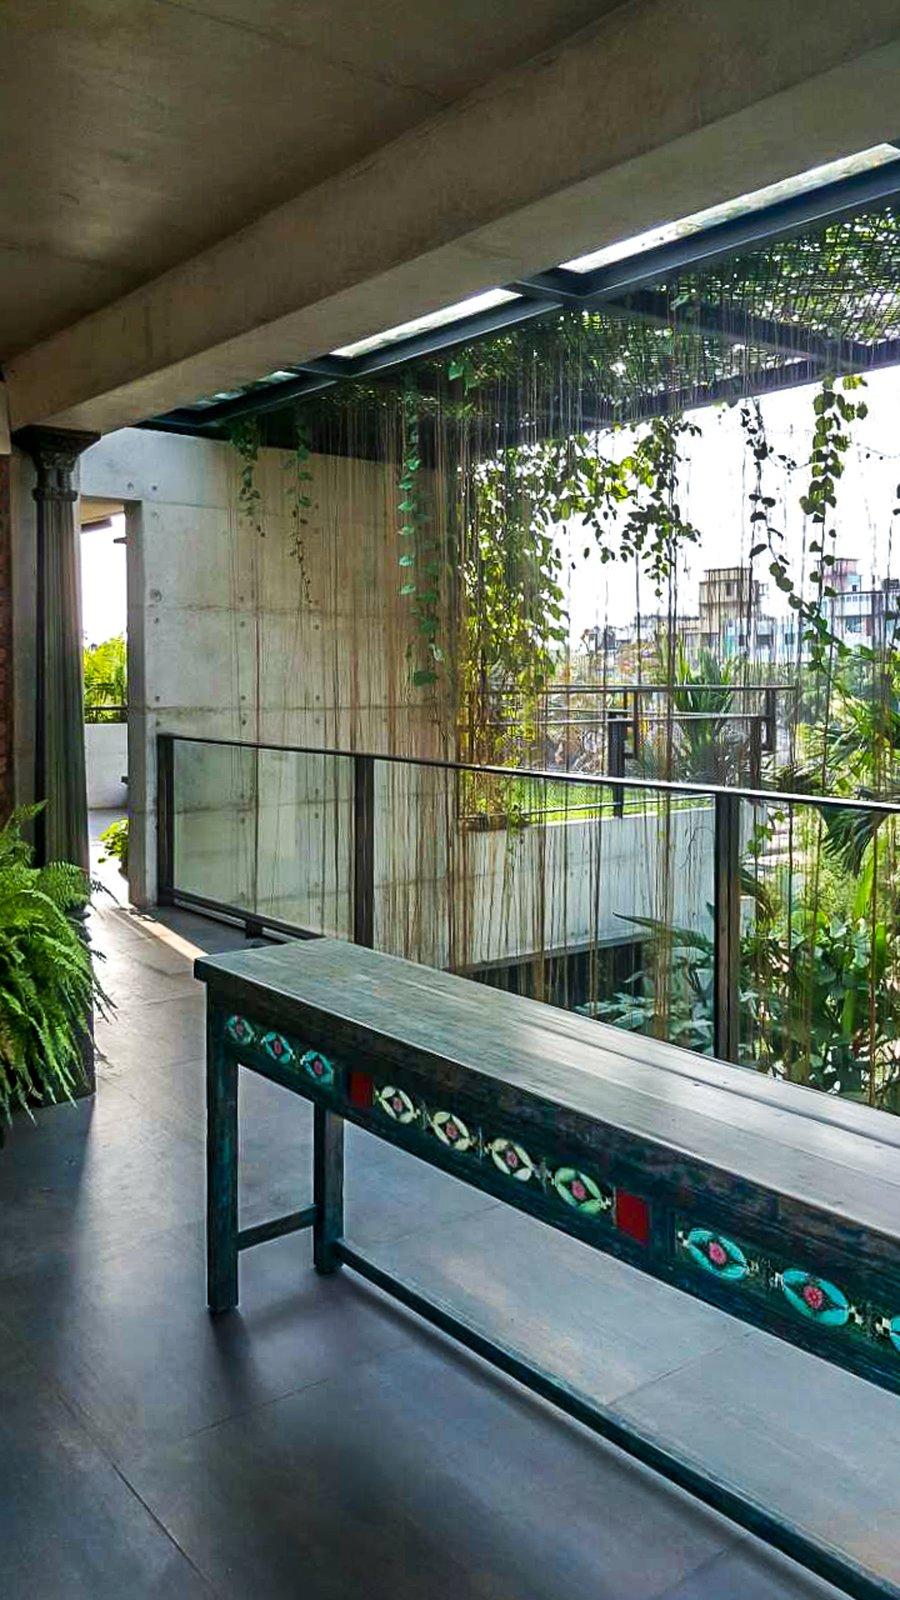 Tagged: Hallway.  Best Hallway Photos from DIPU & SHARMIN RESIDENCE